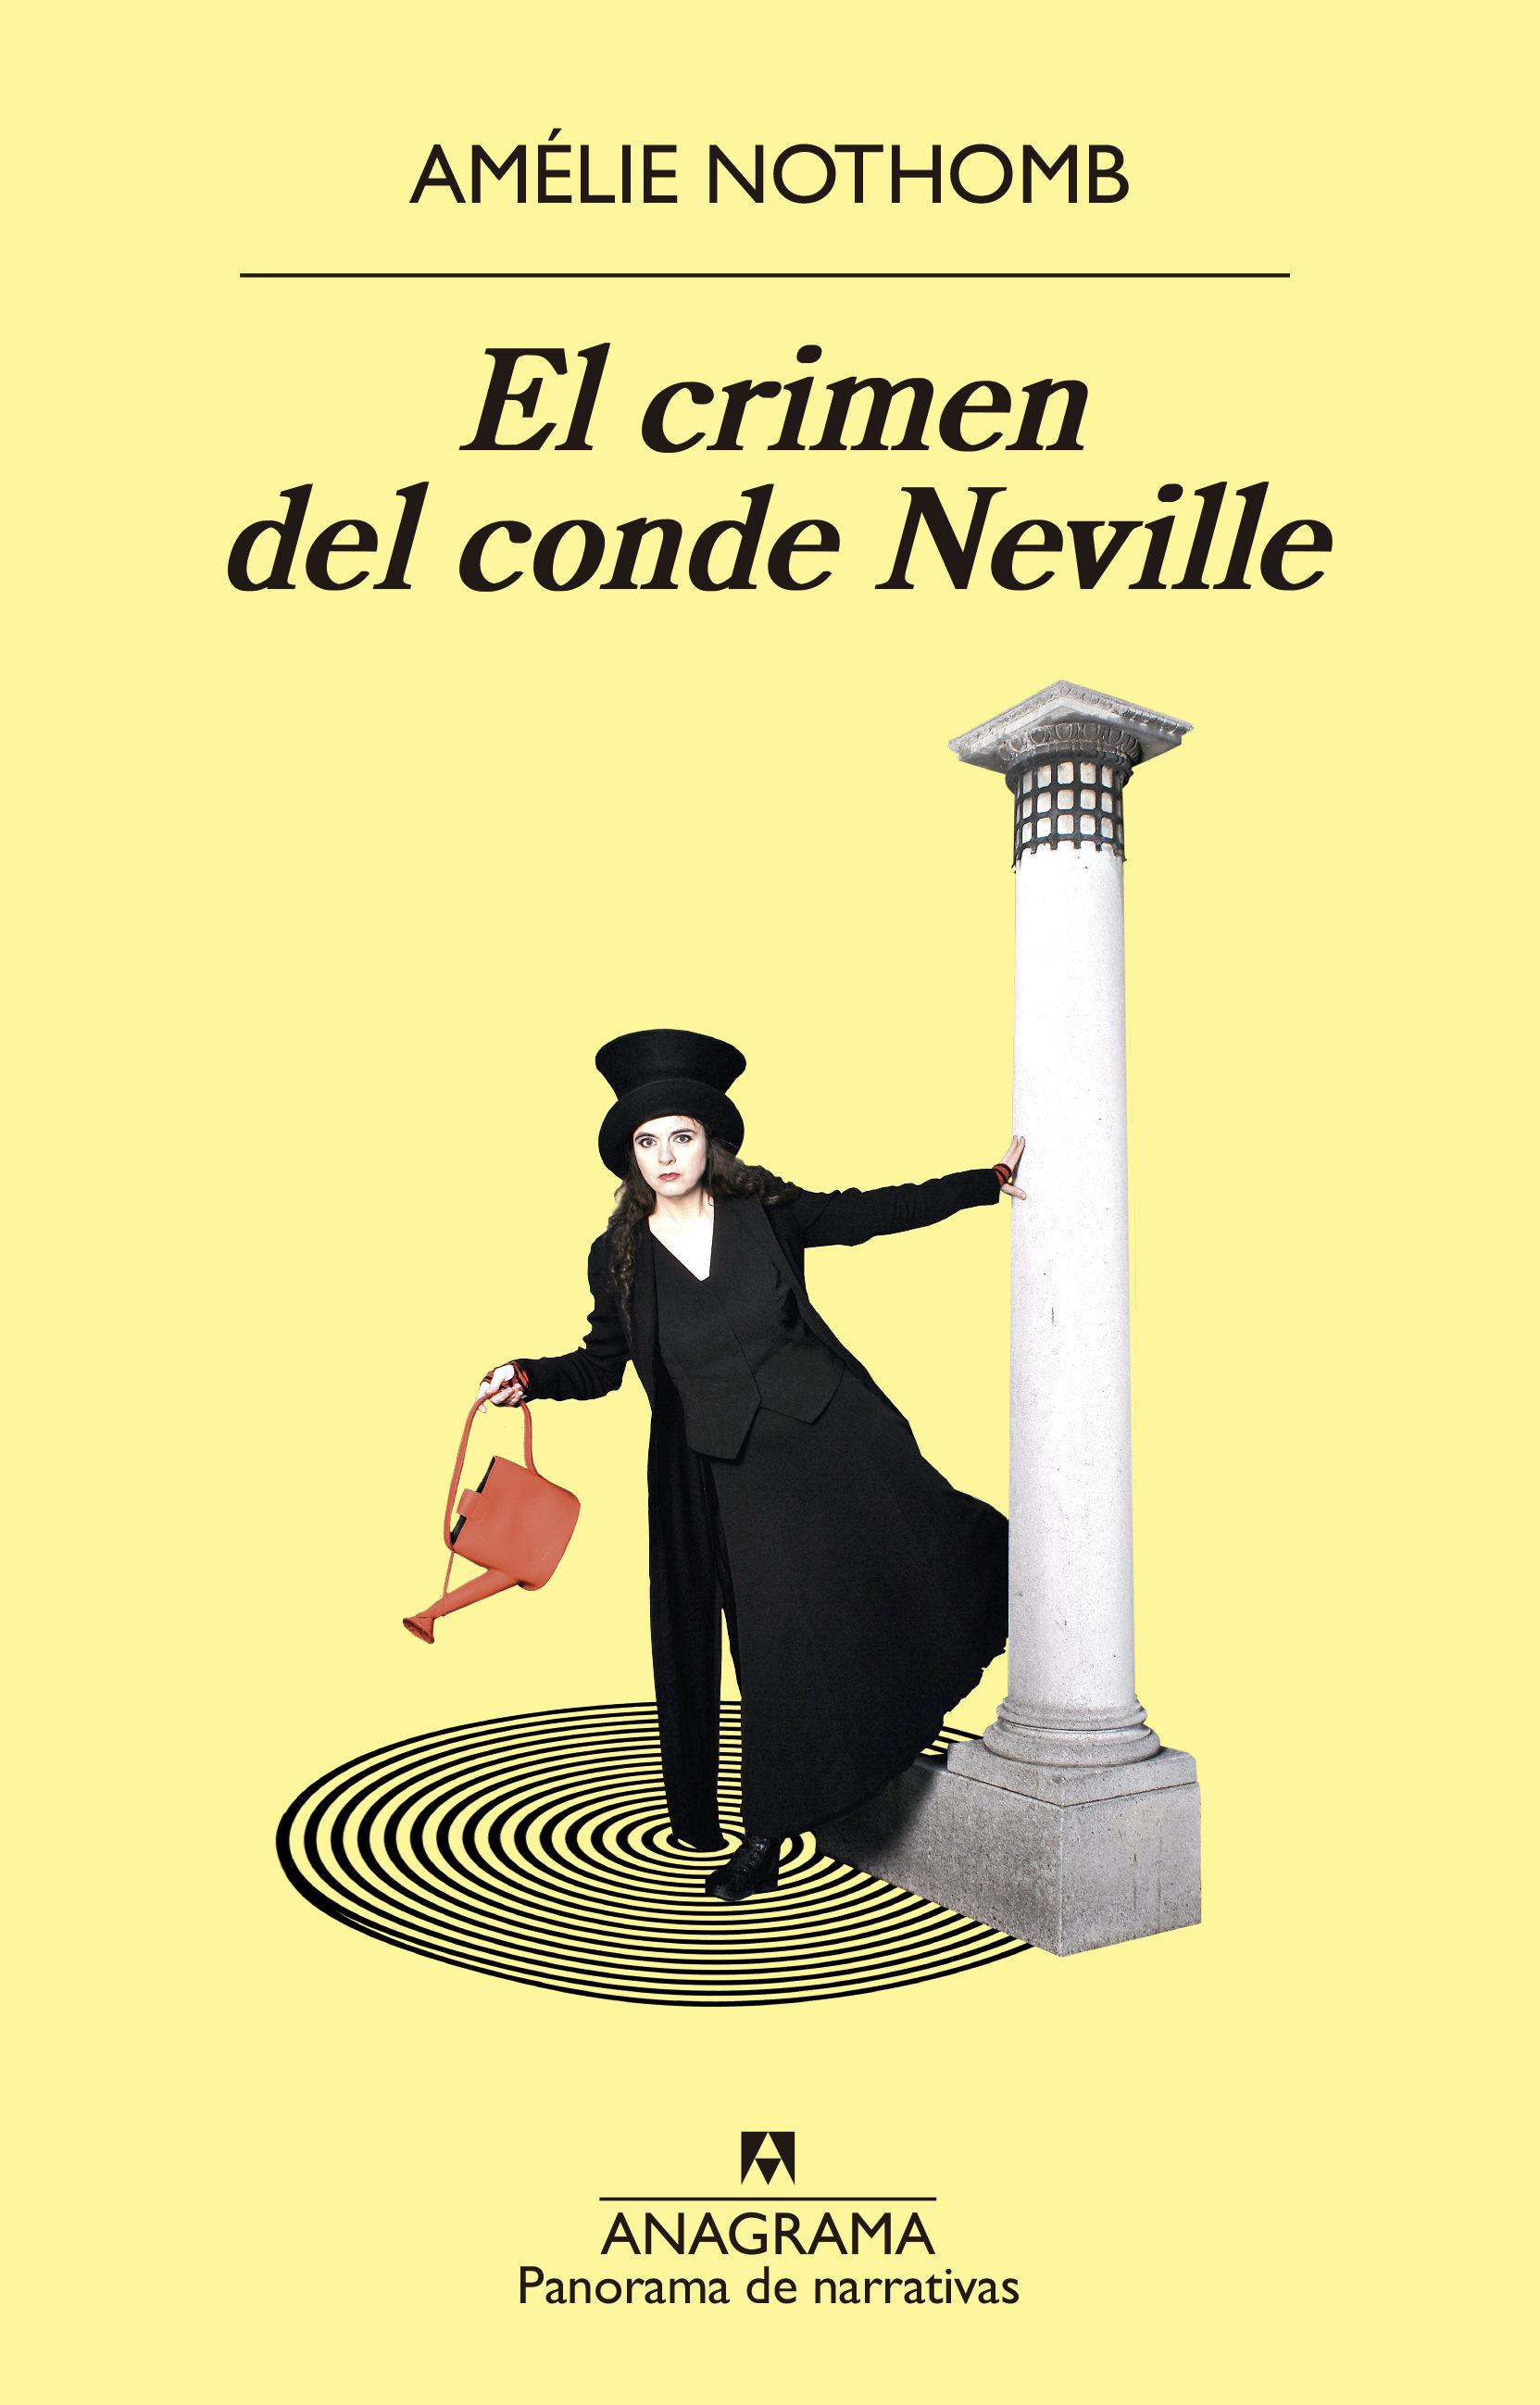 el crimen del conde neville-amelie nothomb-9788433979865